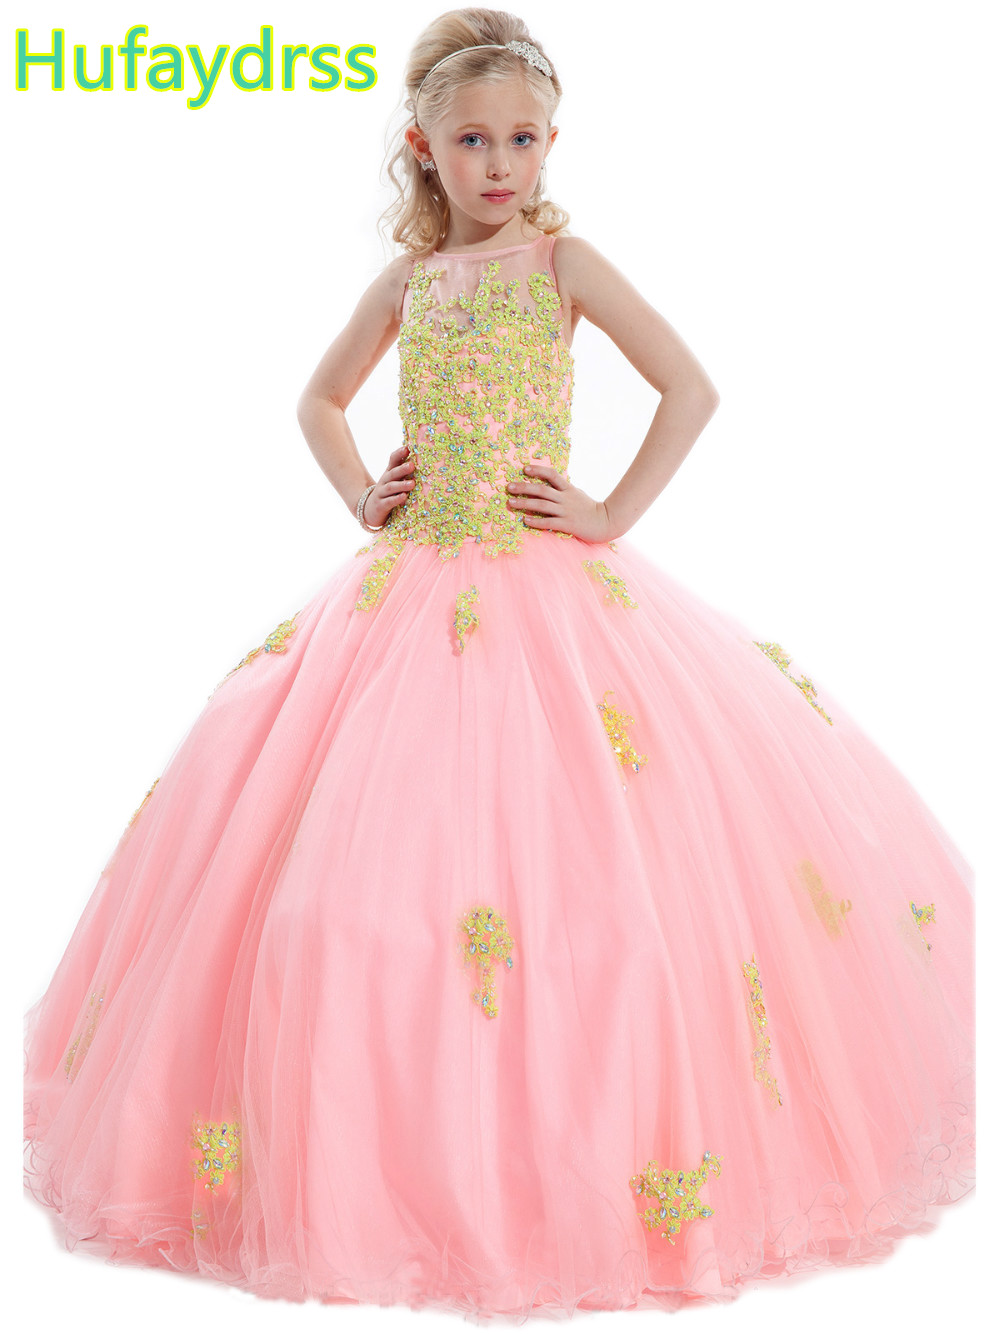 2018 Little Girls Pageant Dress Ball Gown Beads Lace Applique Floor Length Flowe